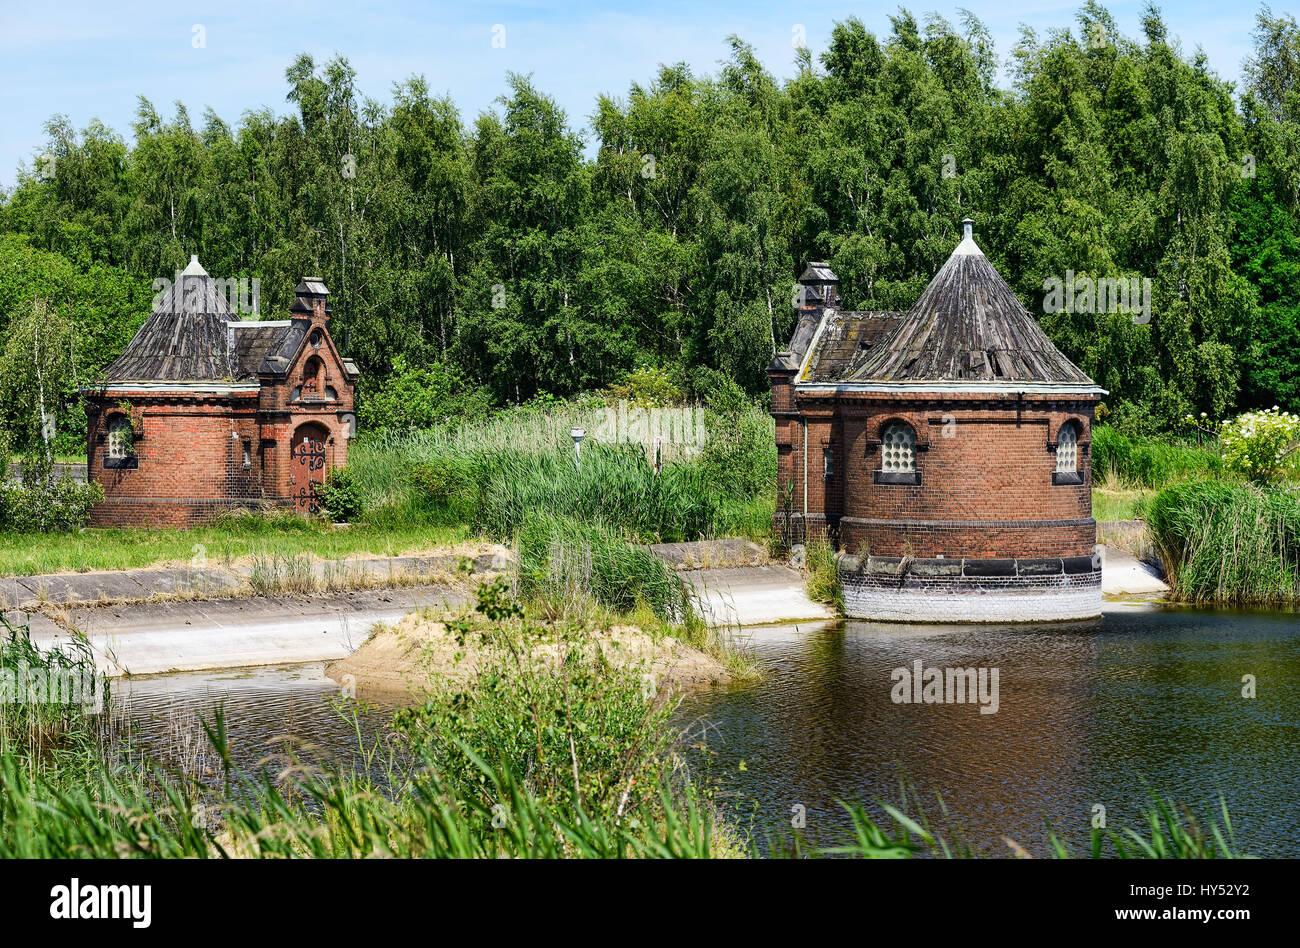 Historical racketeer's small houses in cold court, Rothenburgsort, Hamburg, Germany, Europe, Historische Schieberhaeuschen Stock Photo